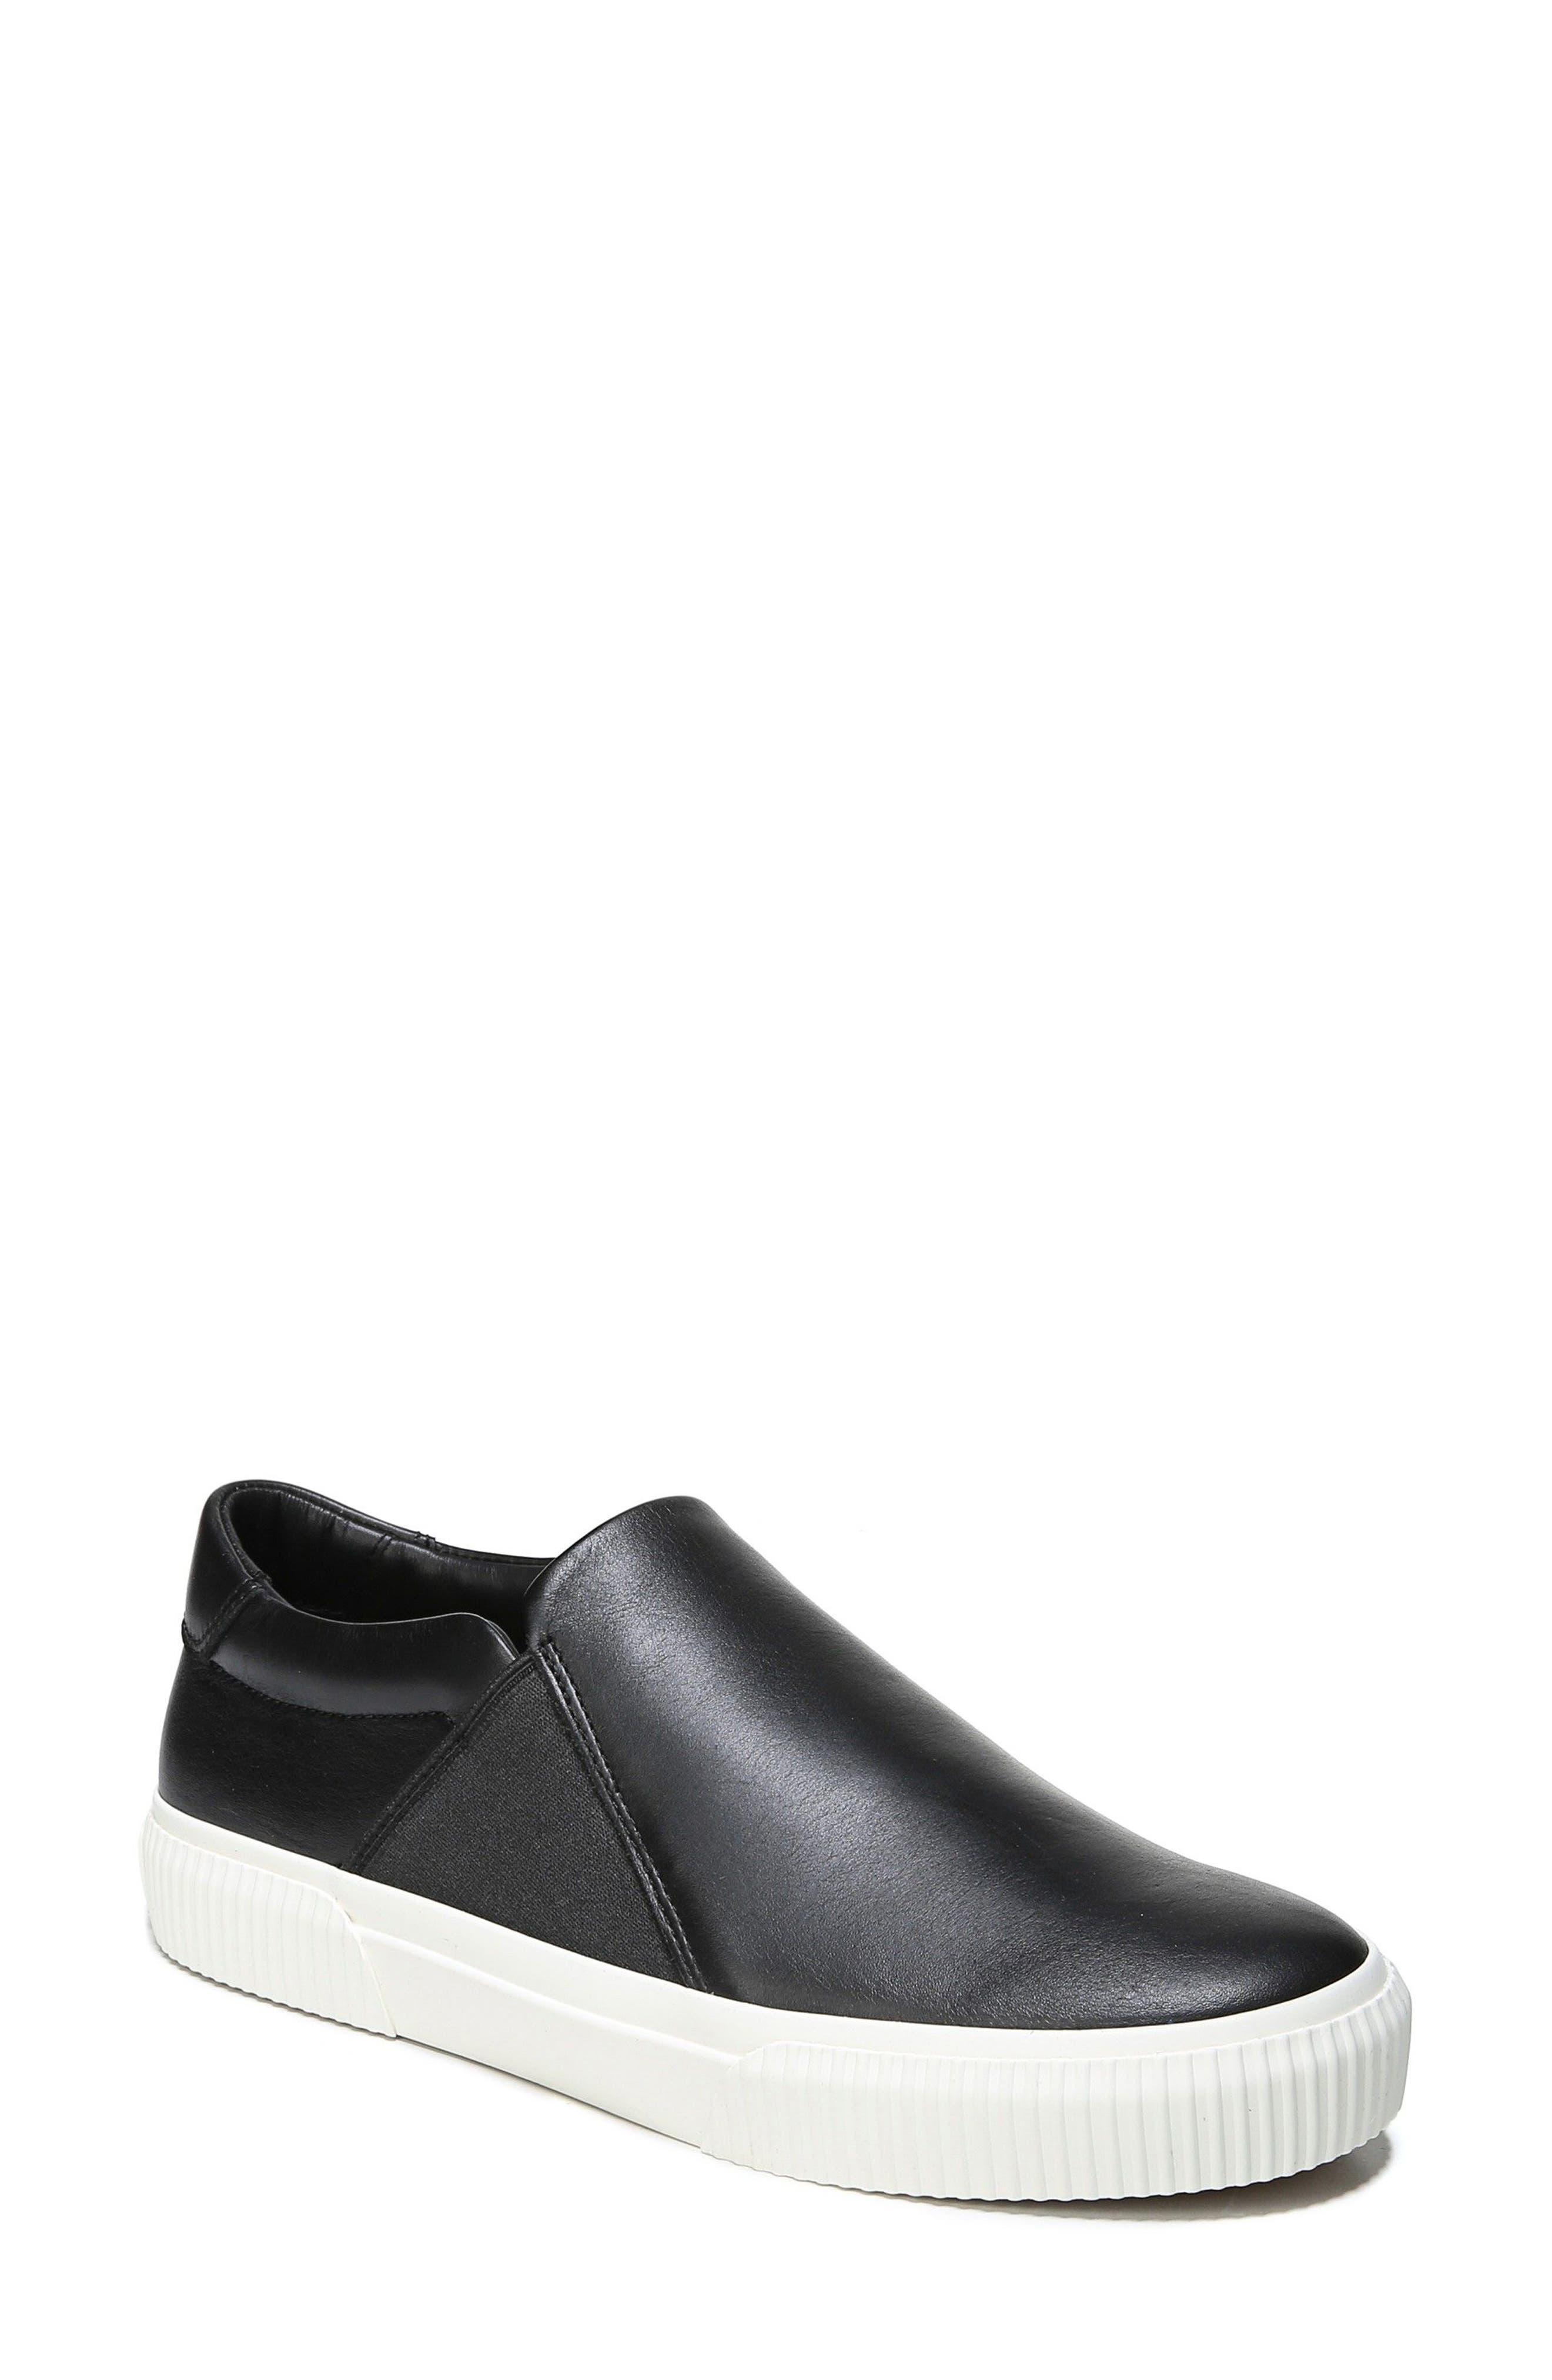 Knox Slip-On Sneaker,                         Main,                         color, 001